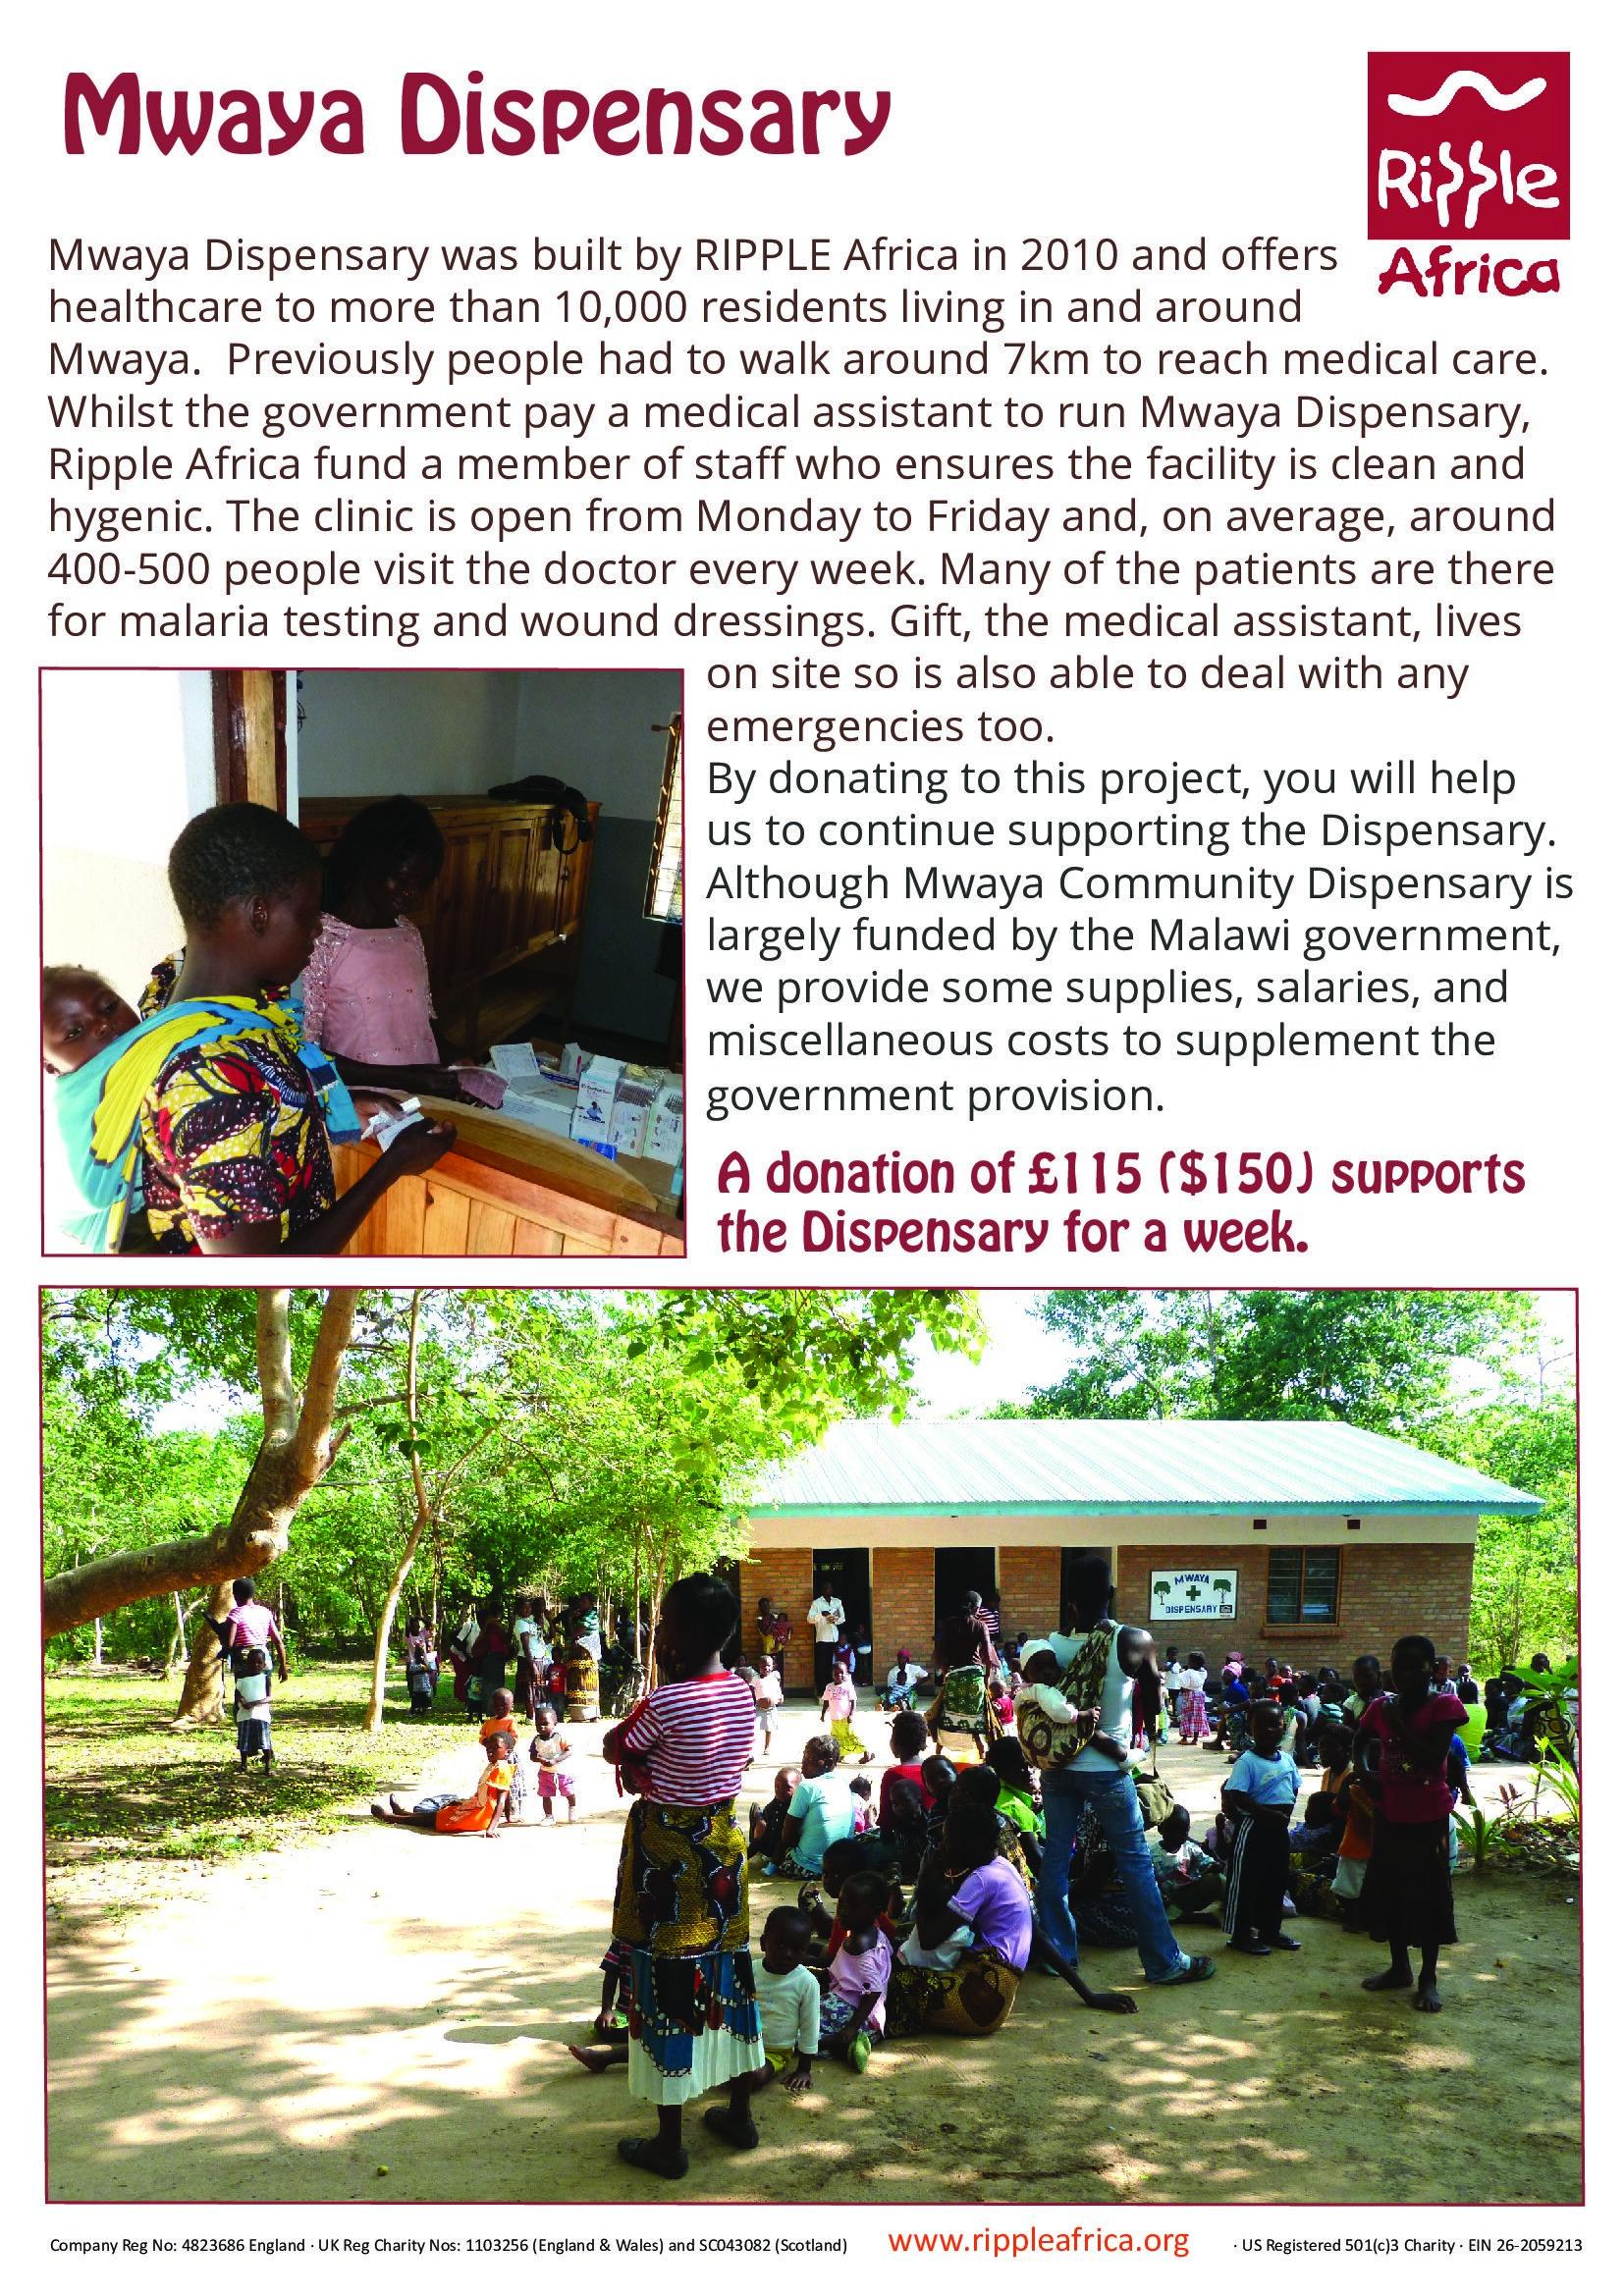 Mwaya Dispensary